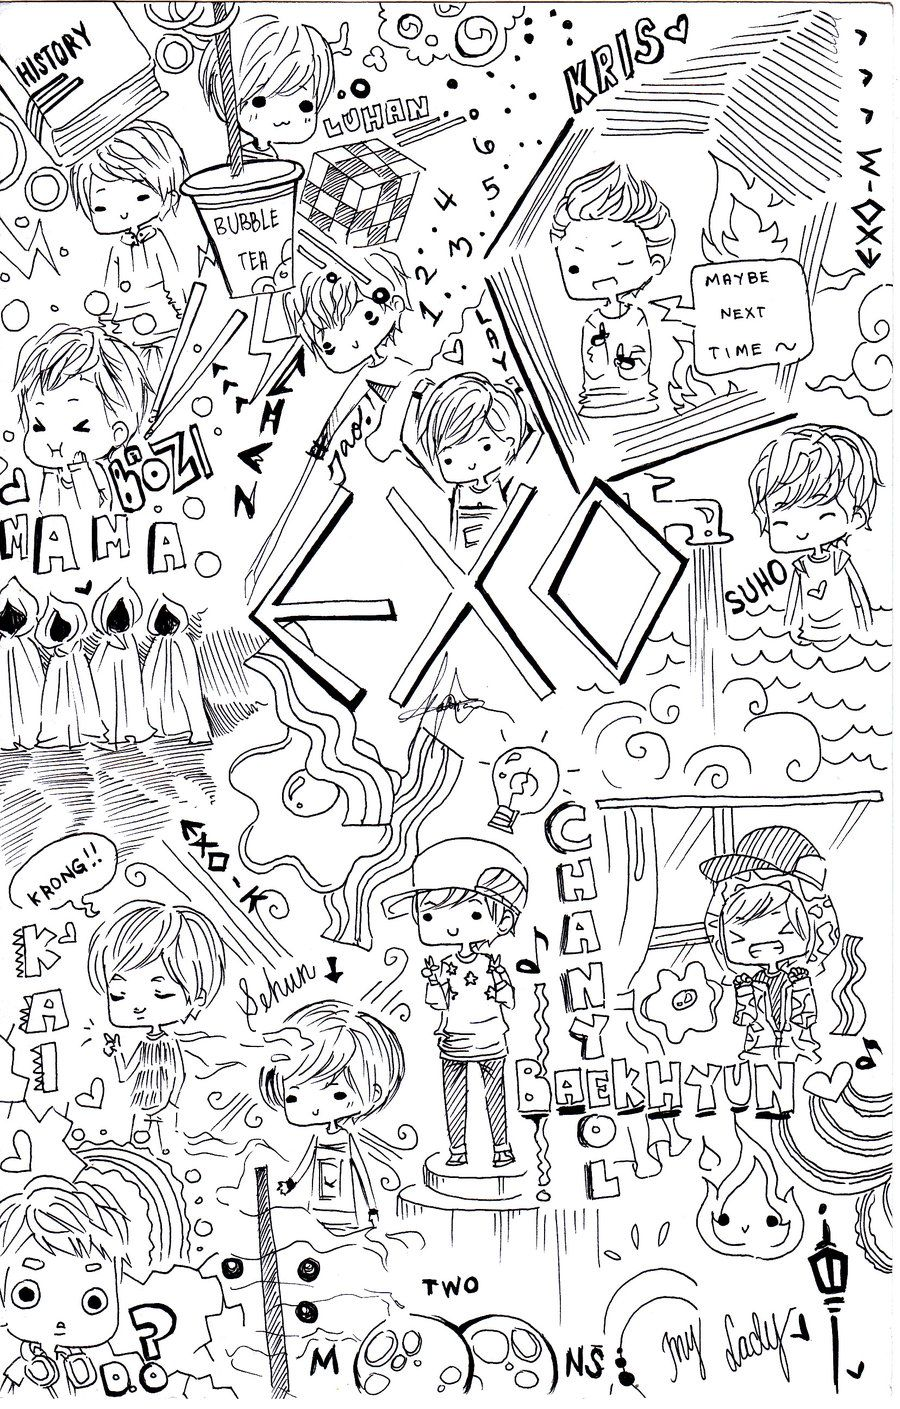 Pin Oleh Pia Di Kpop Exo Cara Menggambar Buku Mewarnai Dan